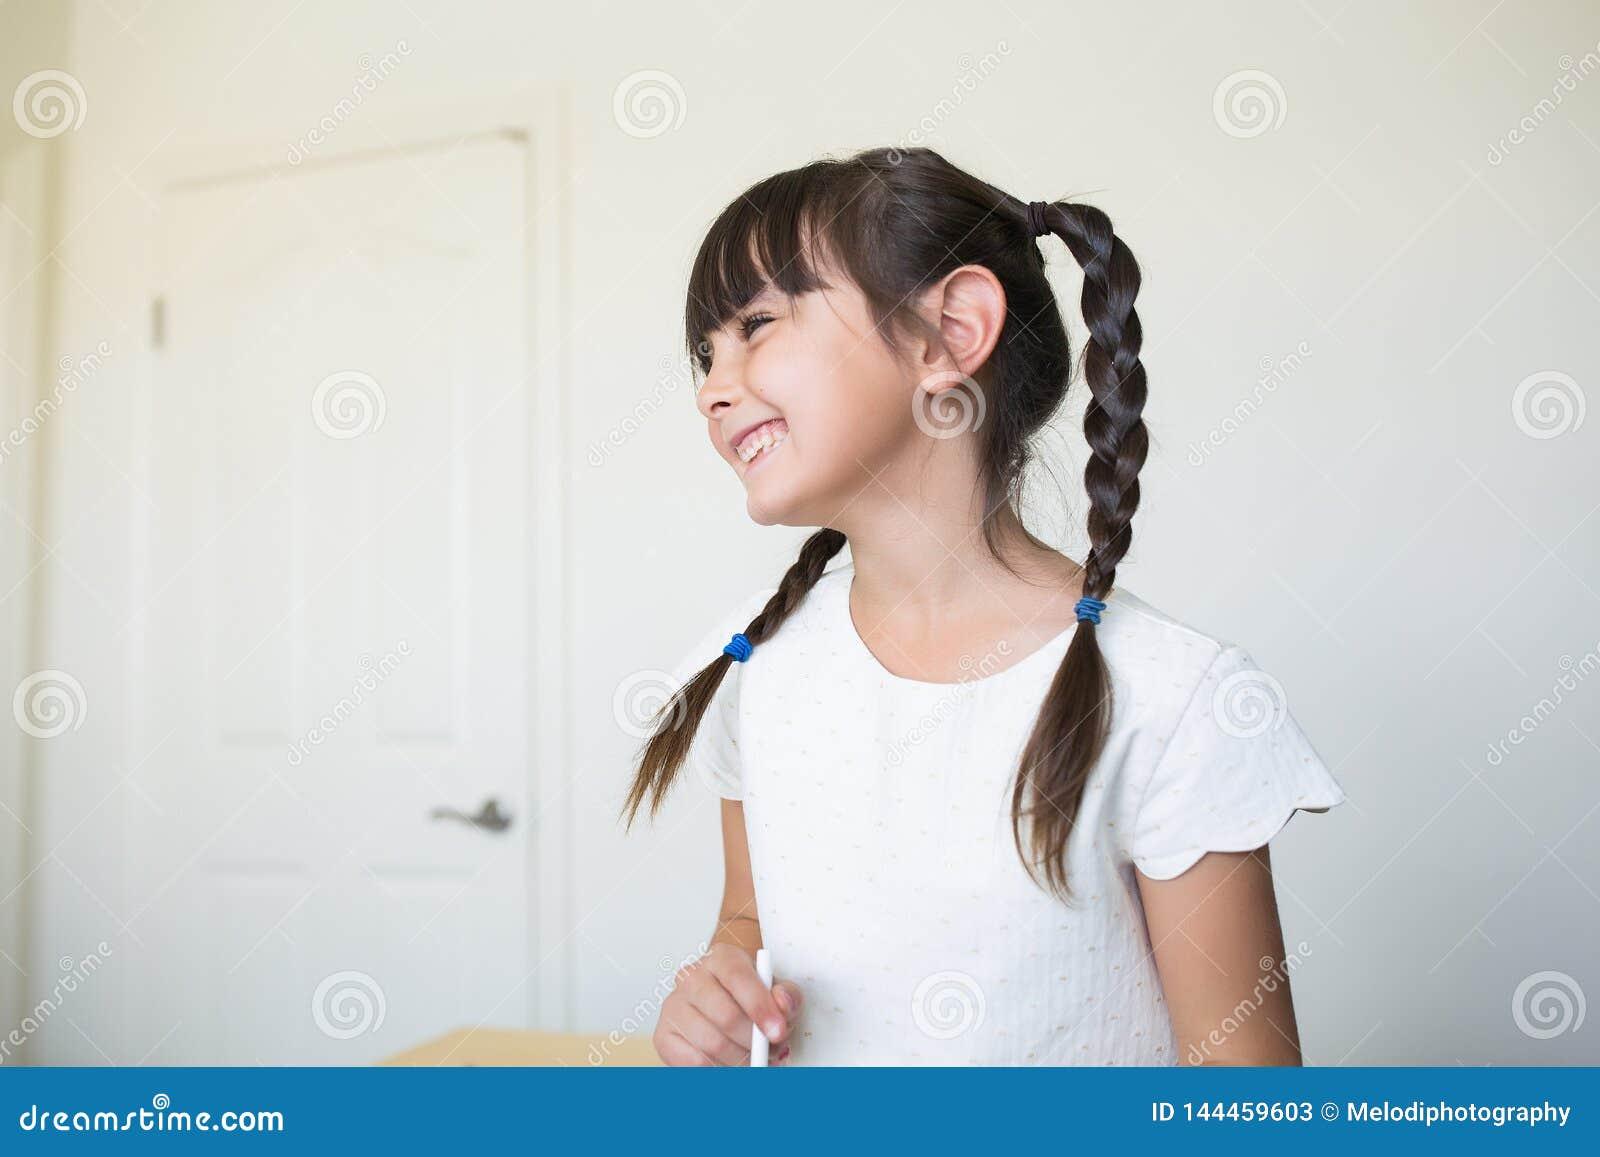 Belle fille riant et regardant loin